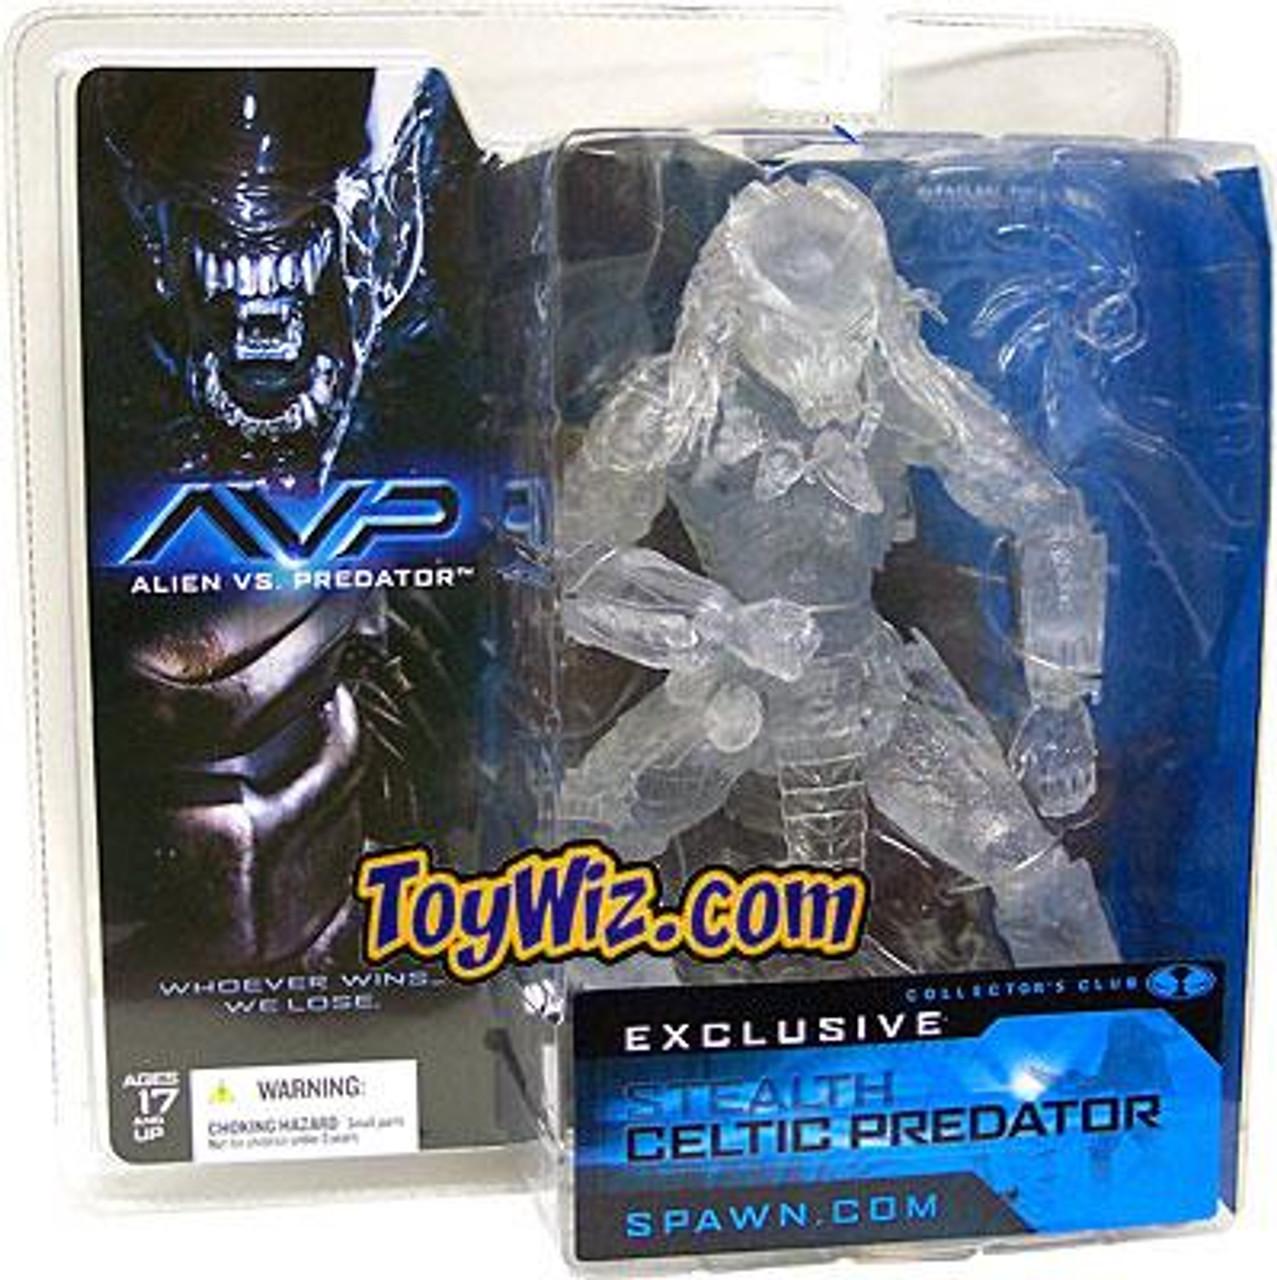 McFarlane Toys Alien vs Predator Collector's Club Stealth Celtic Predator Exclusive Action Figure